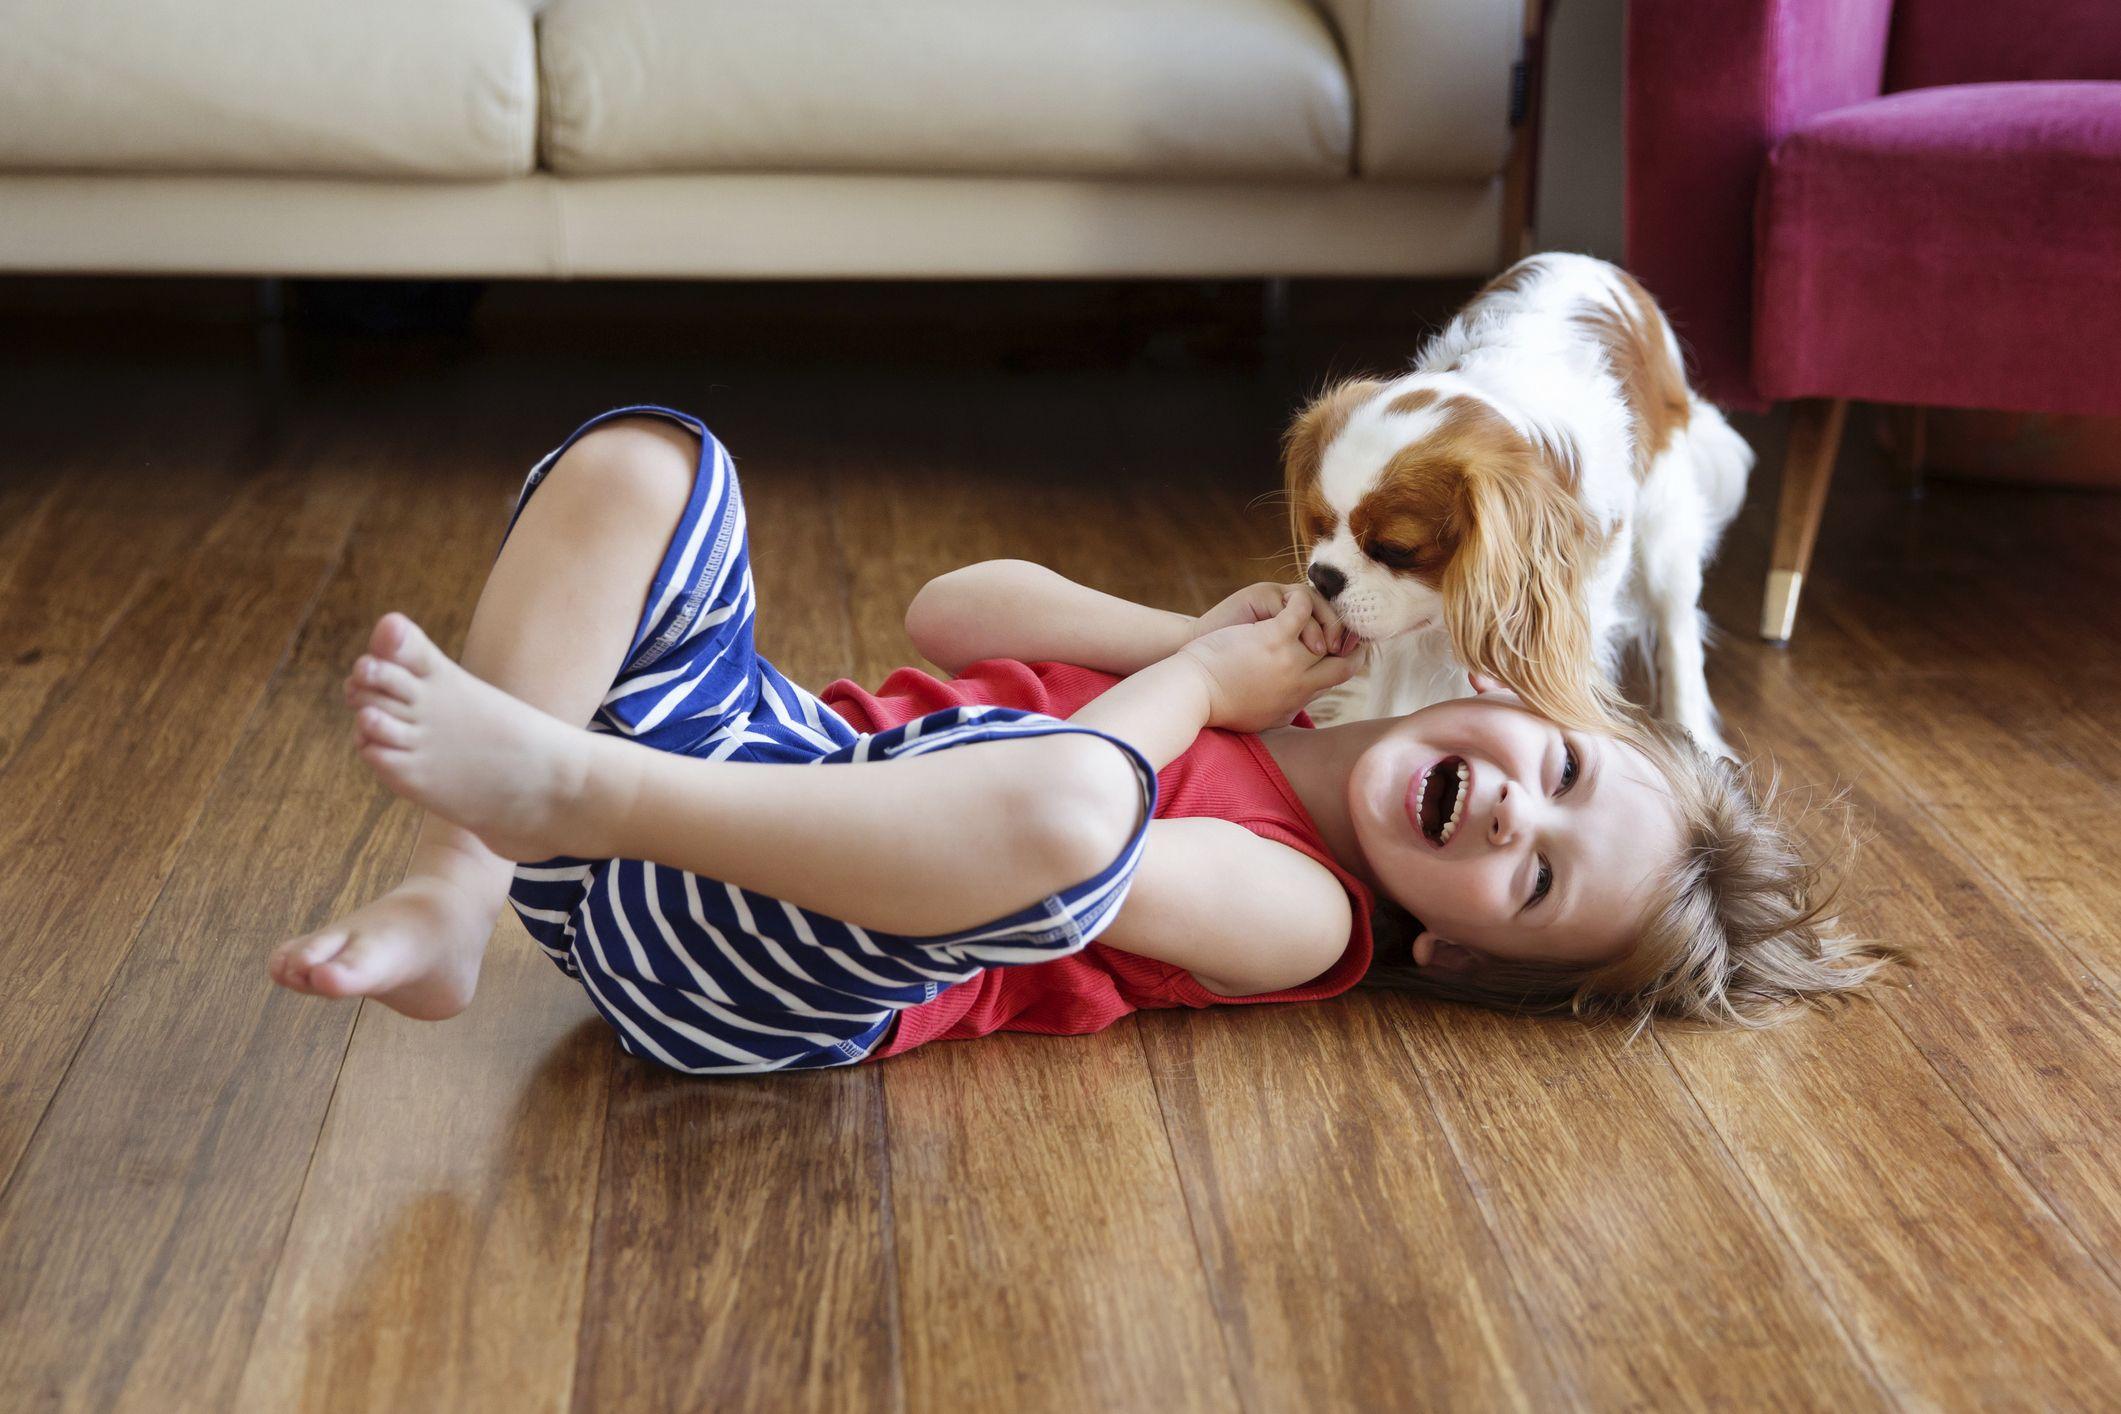 20 Best Family Dogs - Best Dog Breeds for Kids